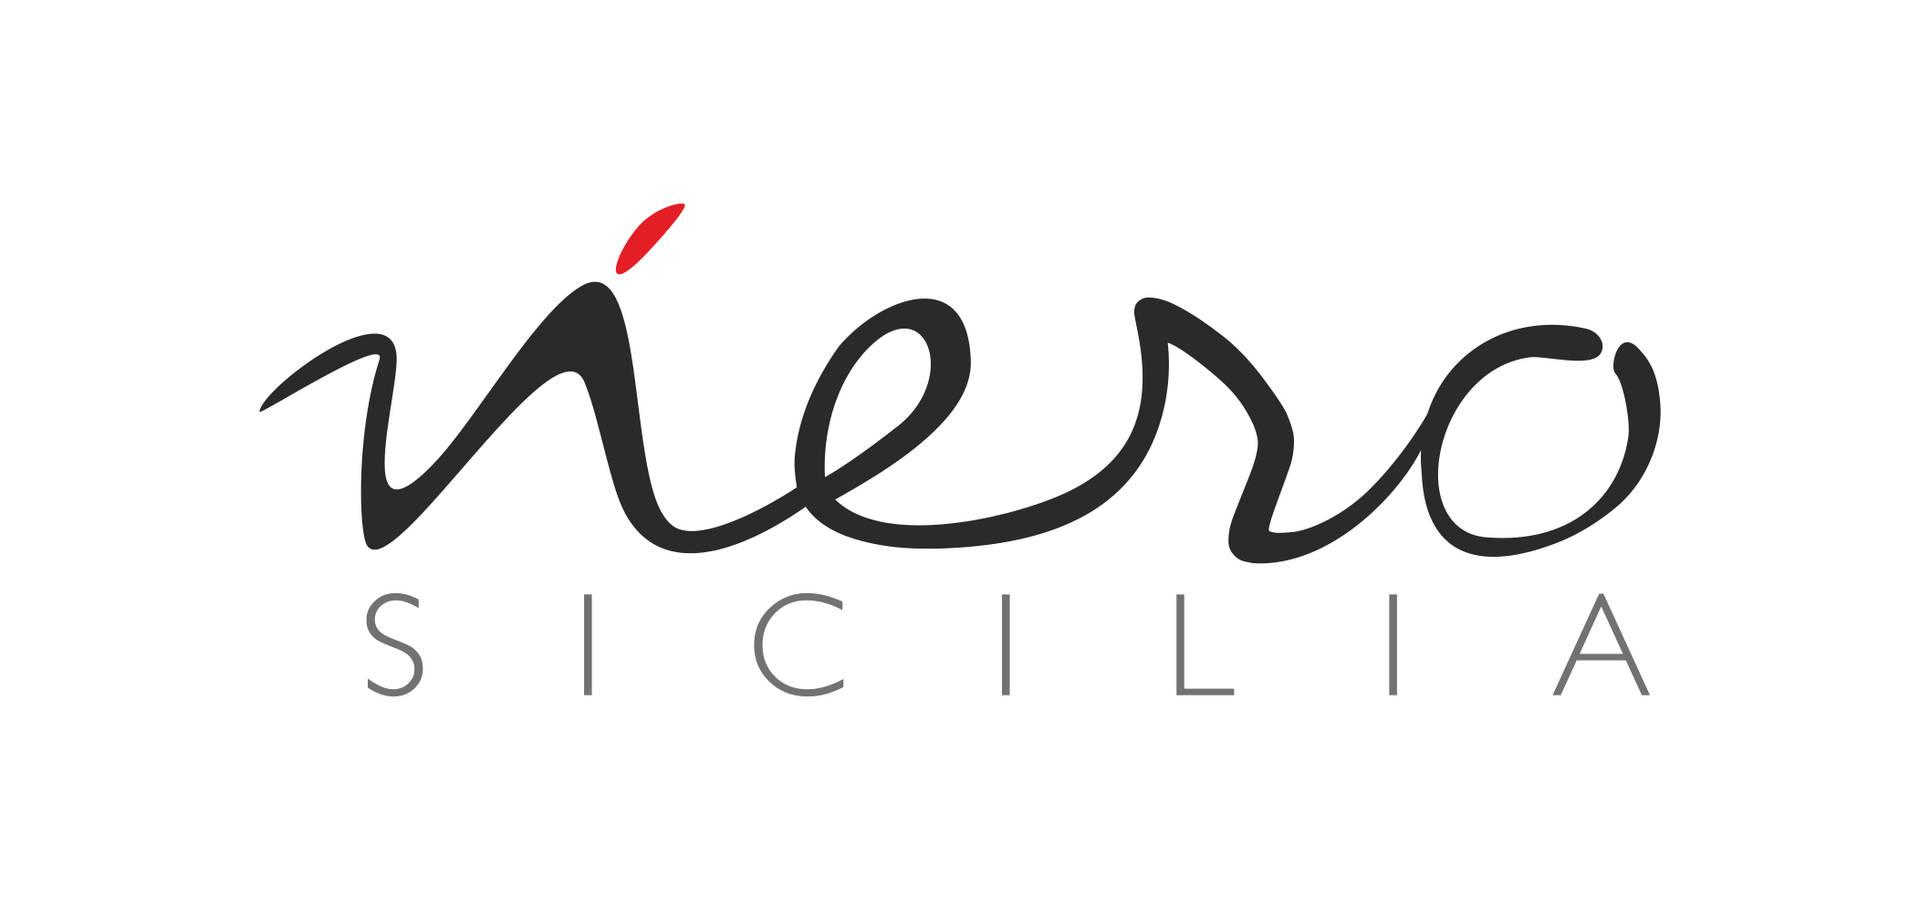 NeroSicilia